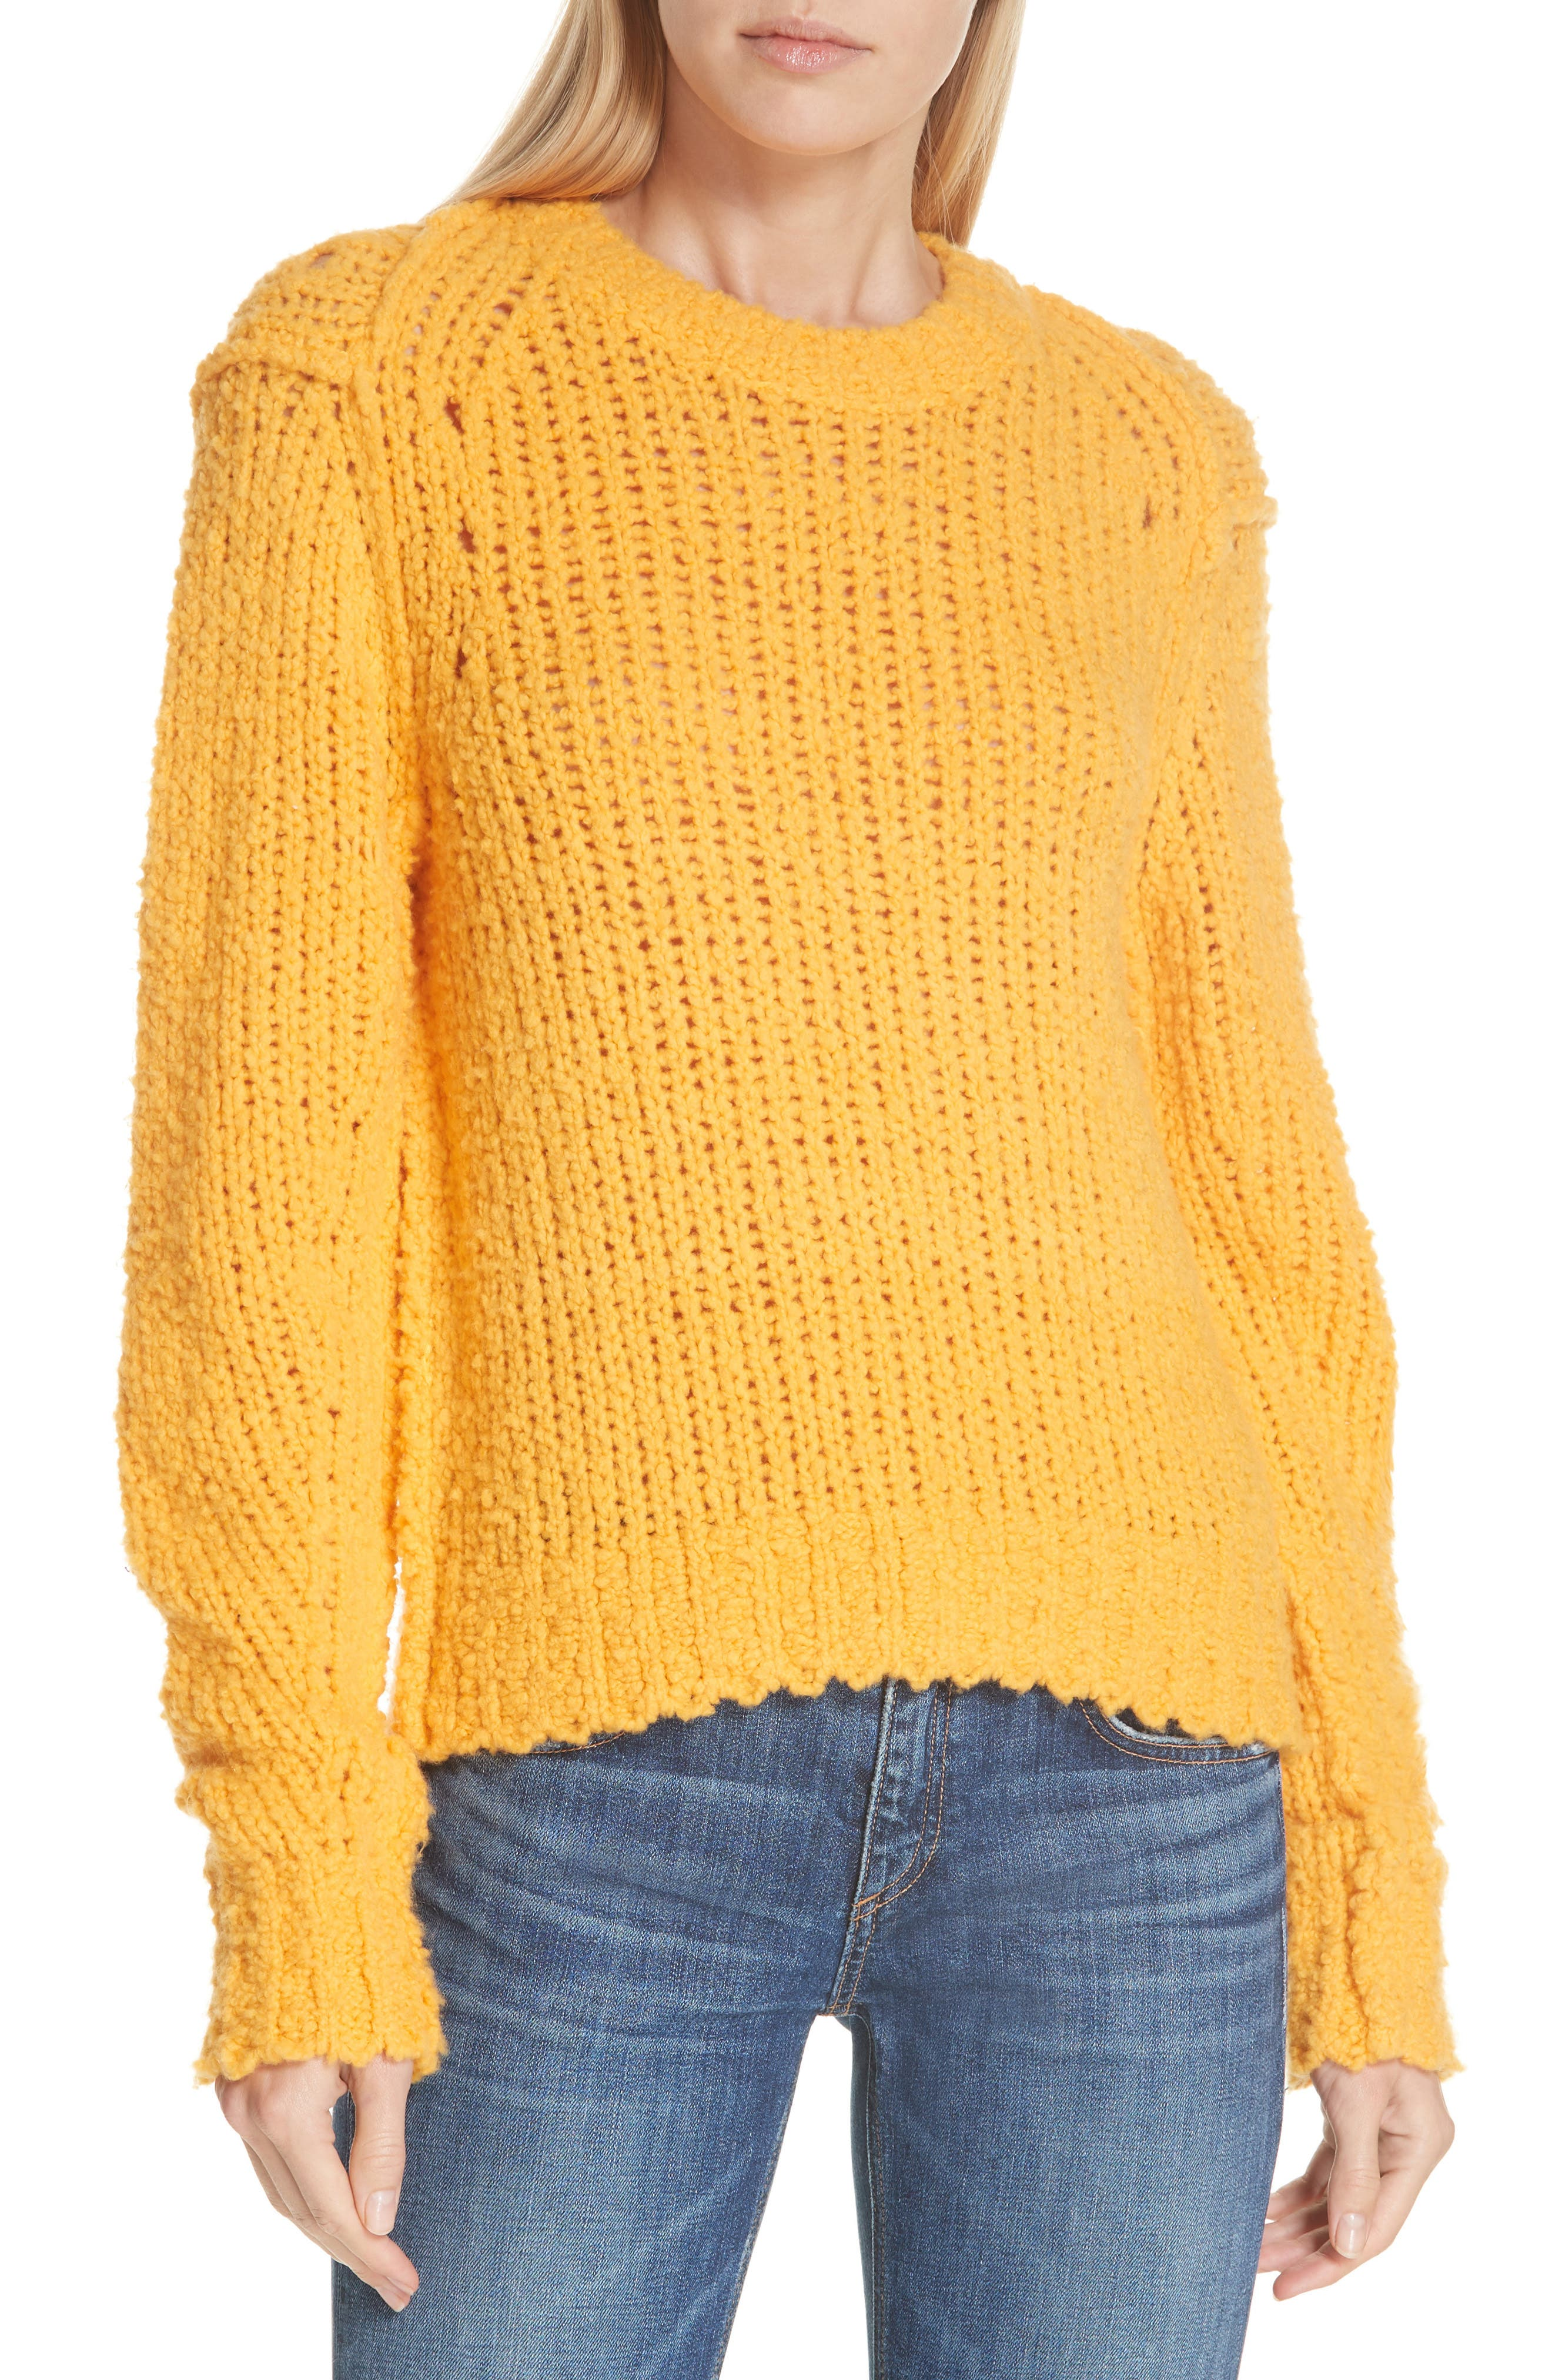 Arizona Merino Wool Sweater,                             Main thumbnail 1, color,                             GOLD